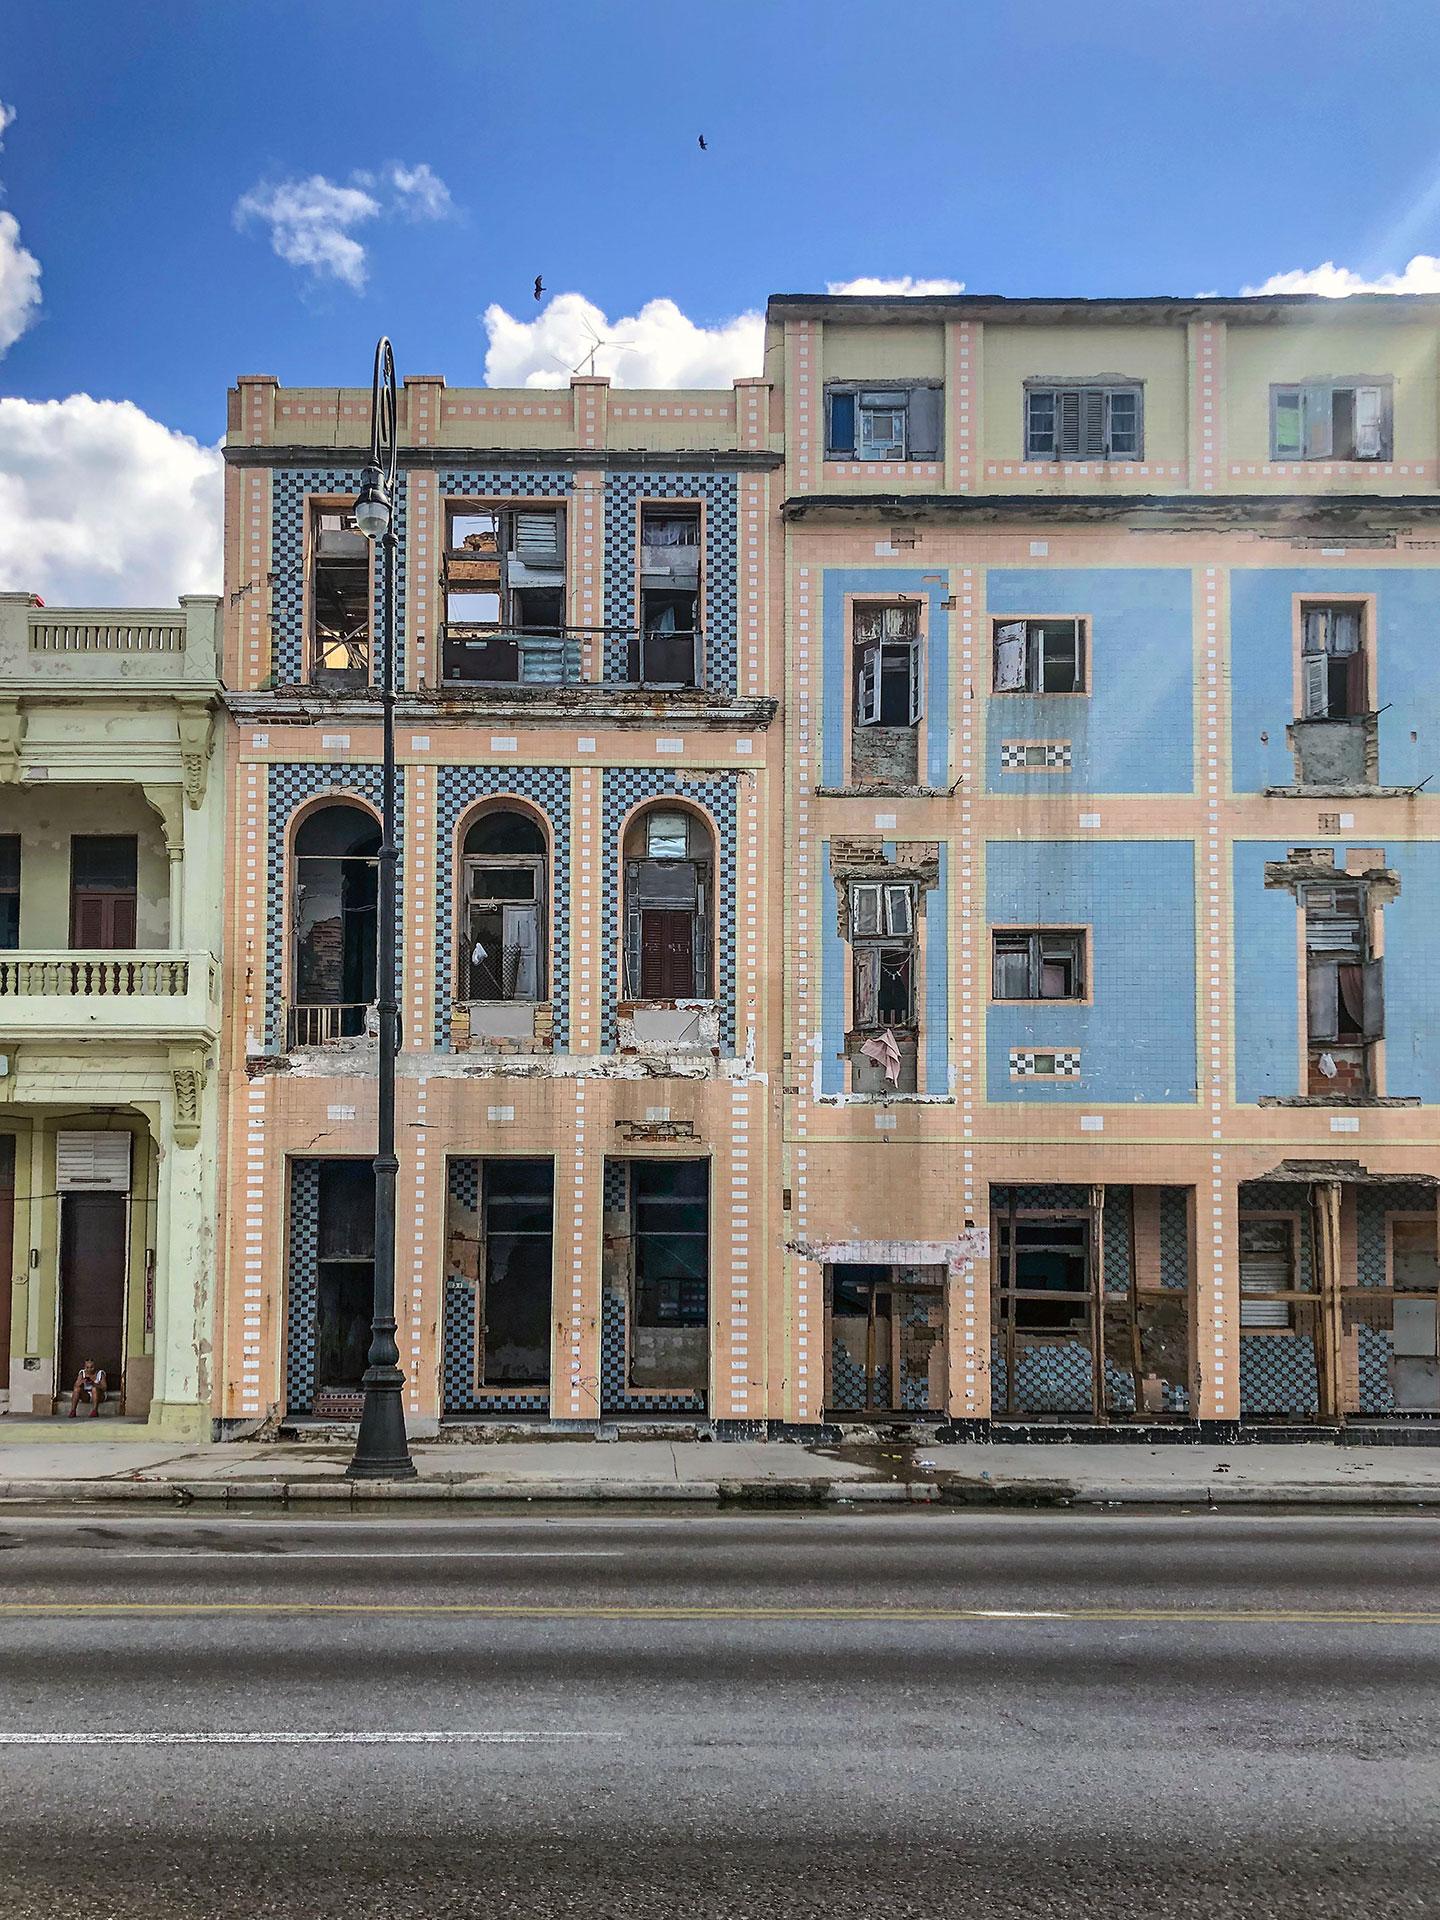 Classic building in Havana, Cuba